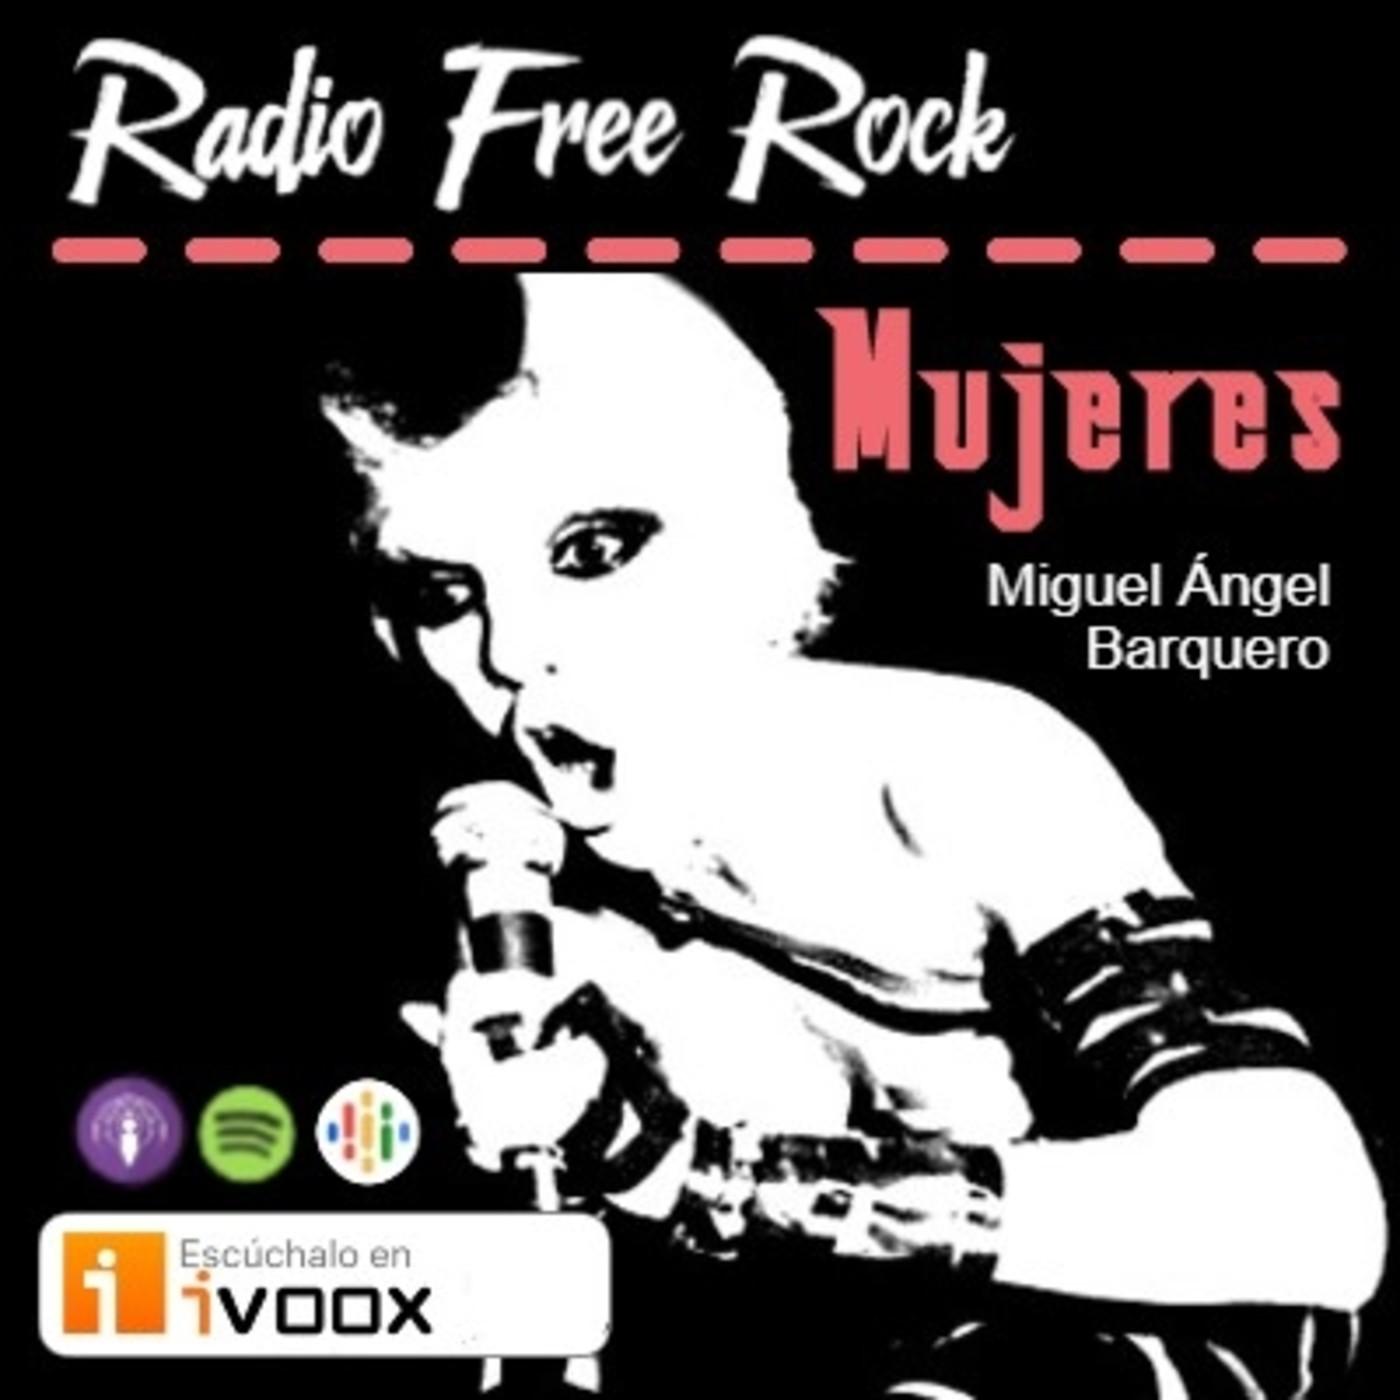 Radio Free Rock: Mujeres